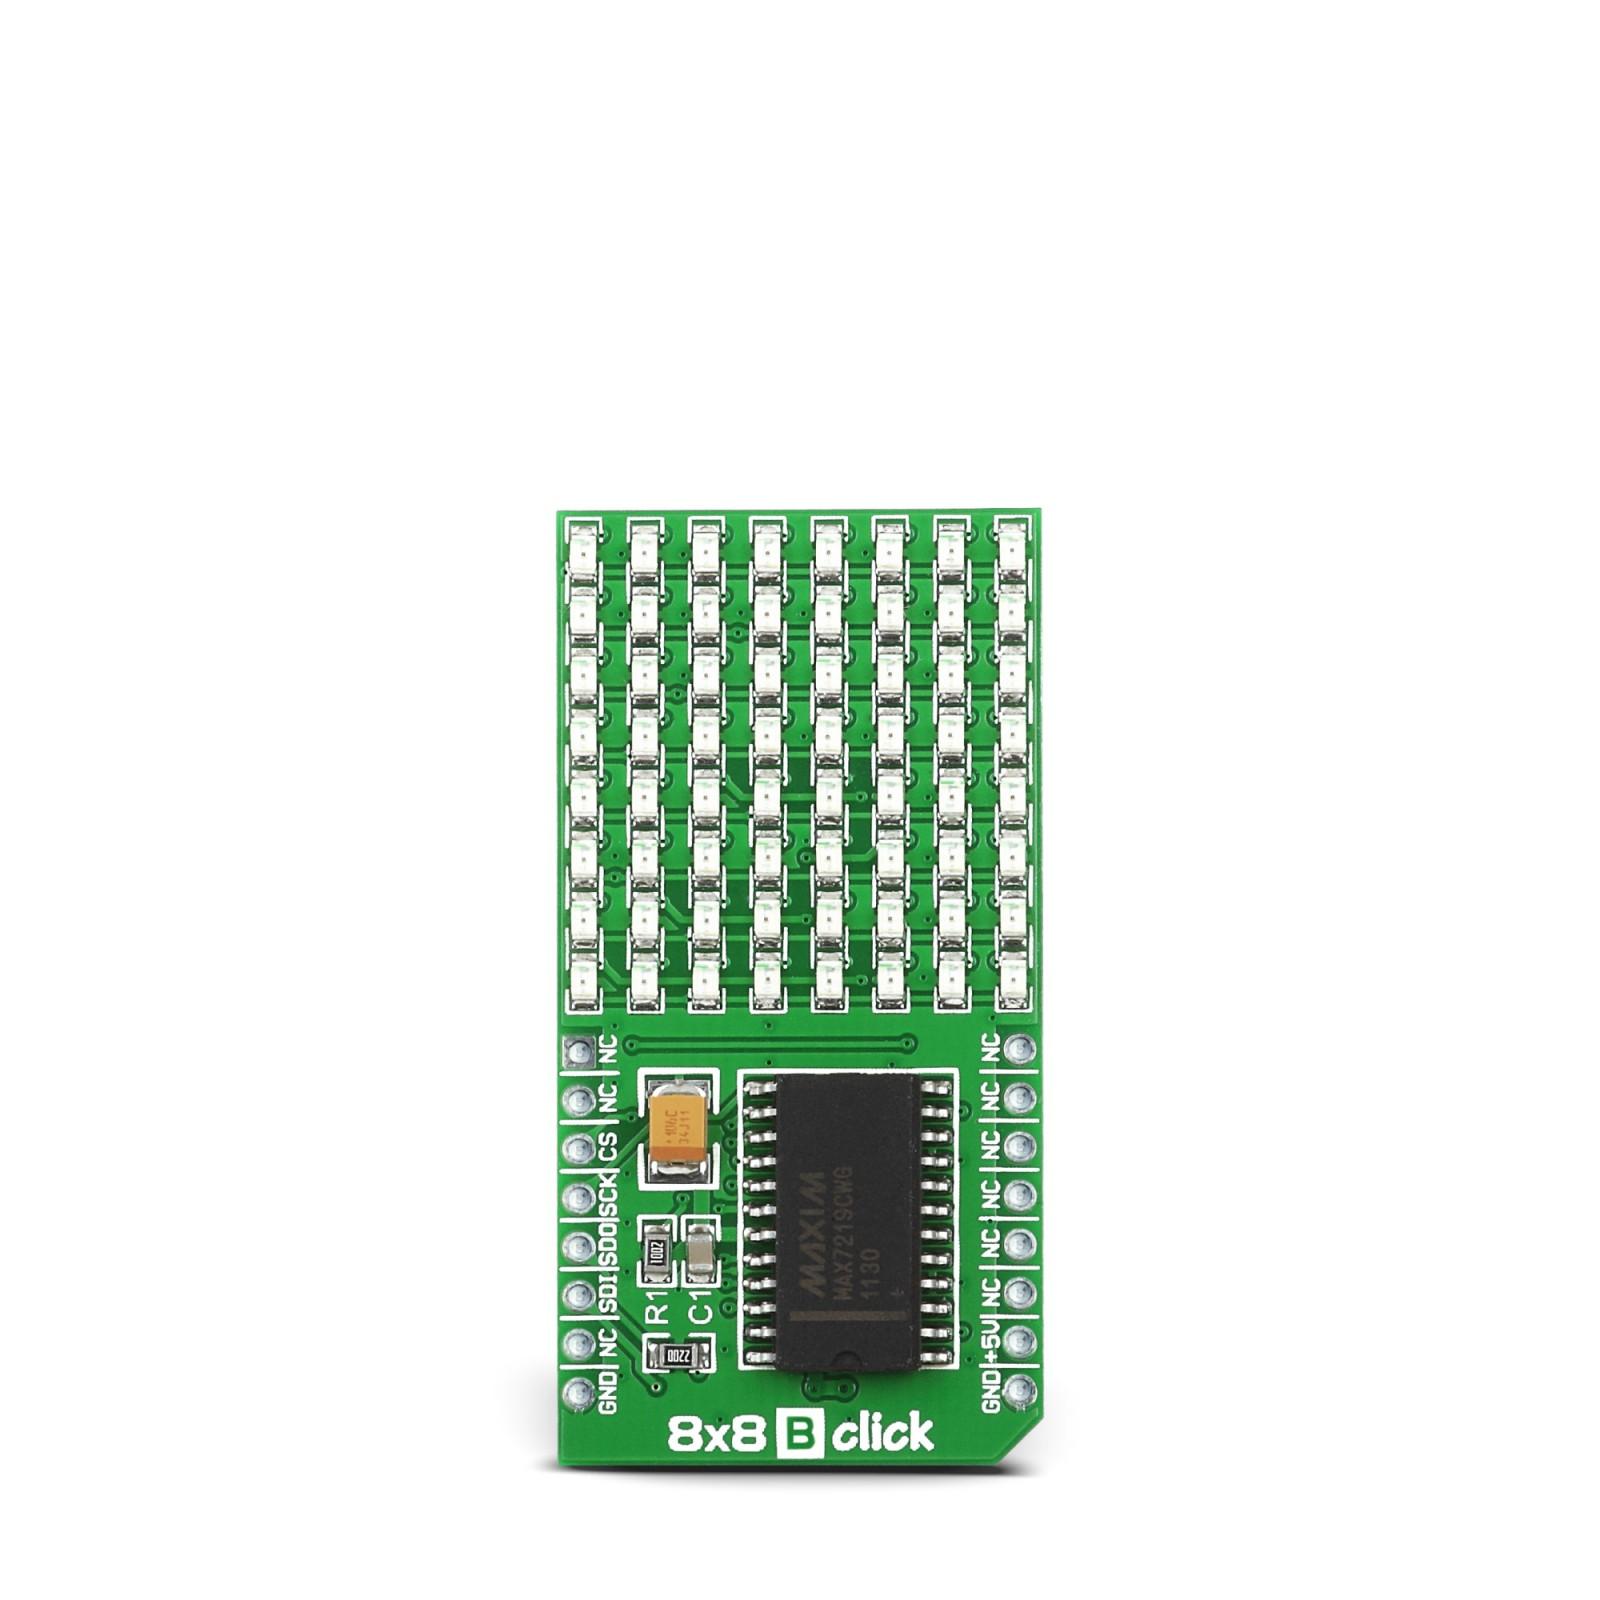 8x8 B Click - Serial 8x8 LED Matrix Display (BLUE)